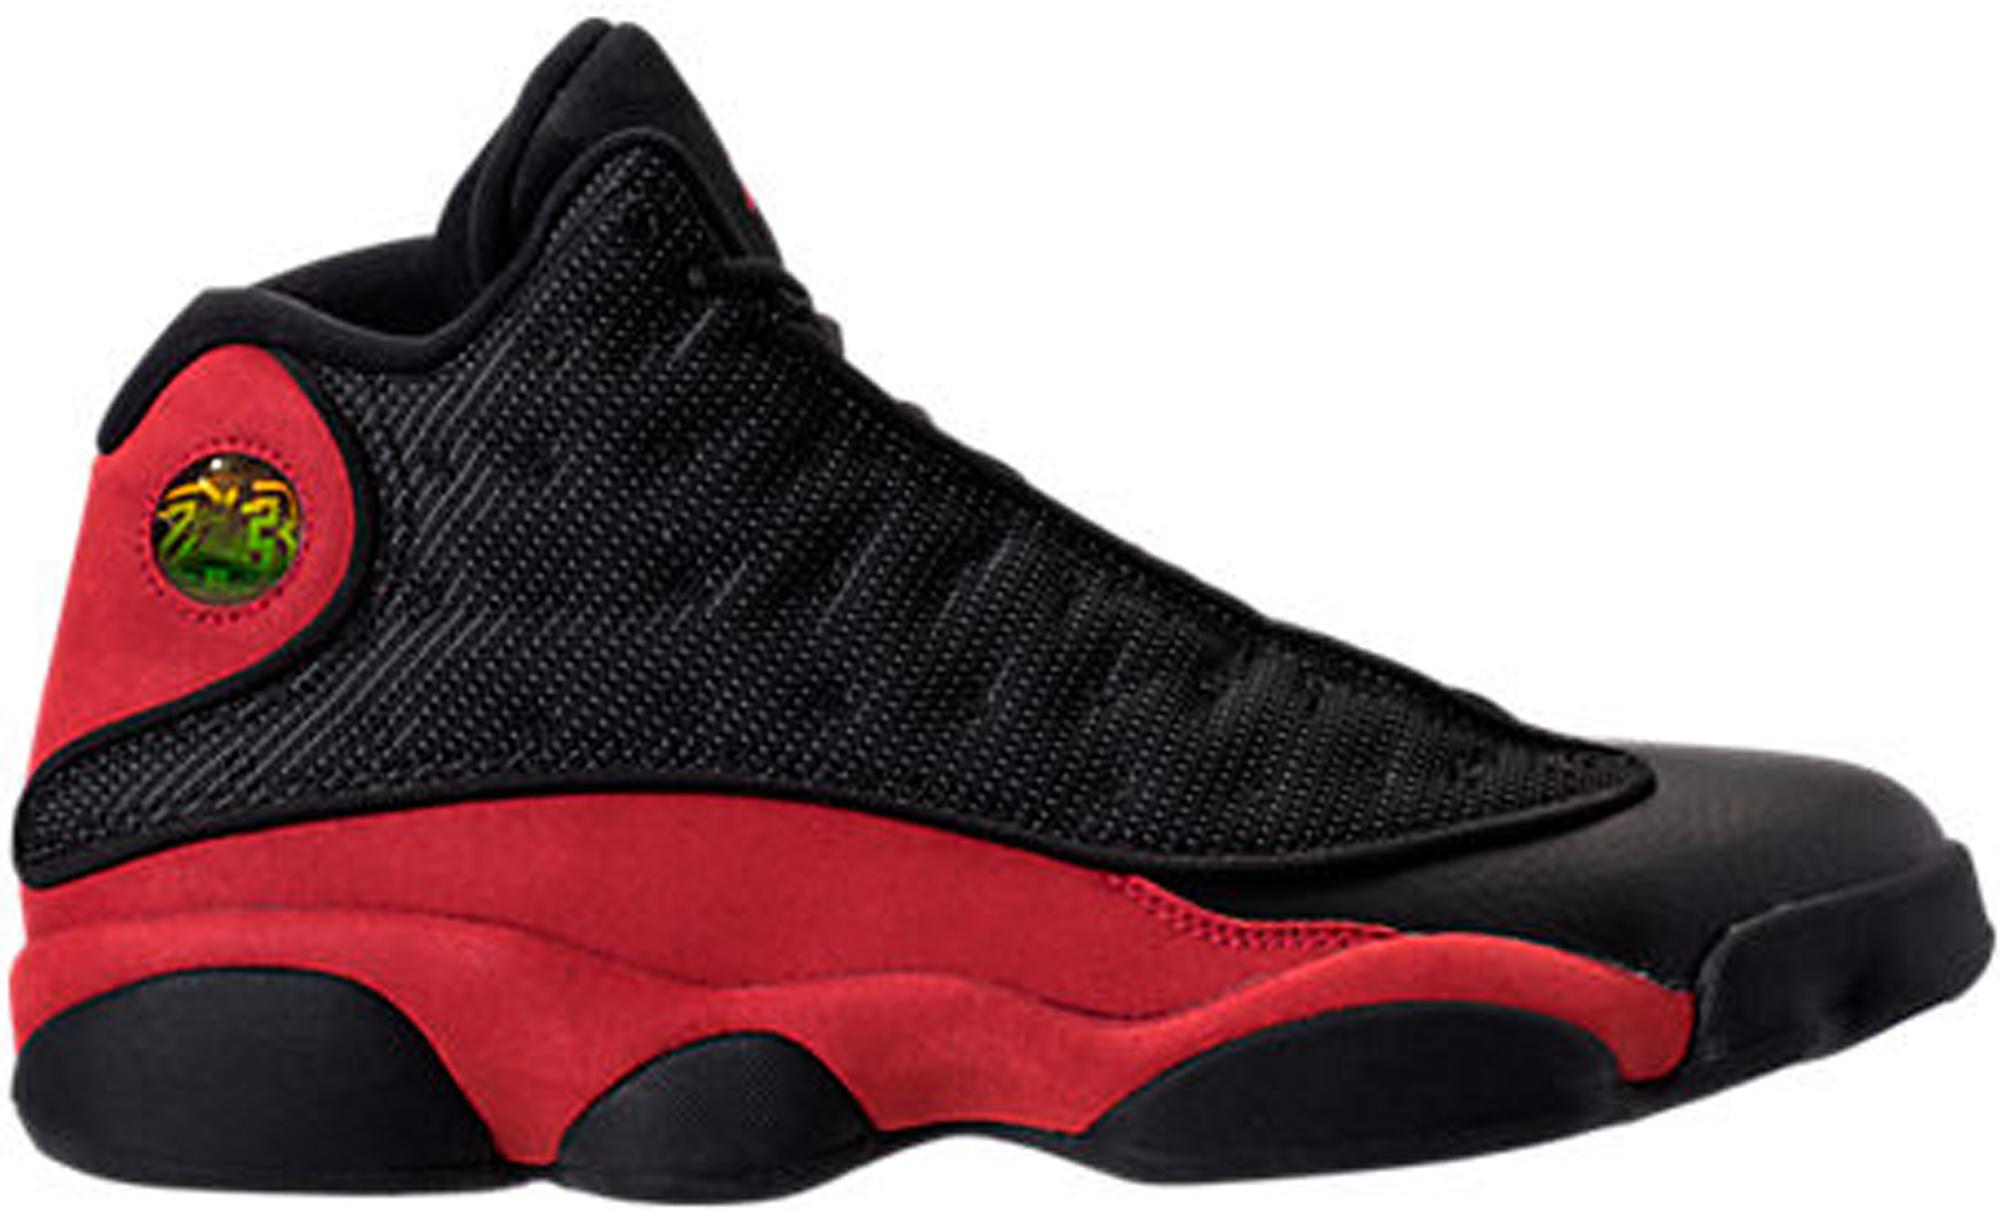 Air Jordan Retro 13 Breds